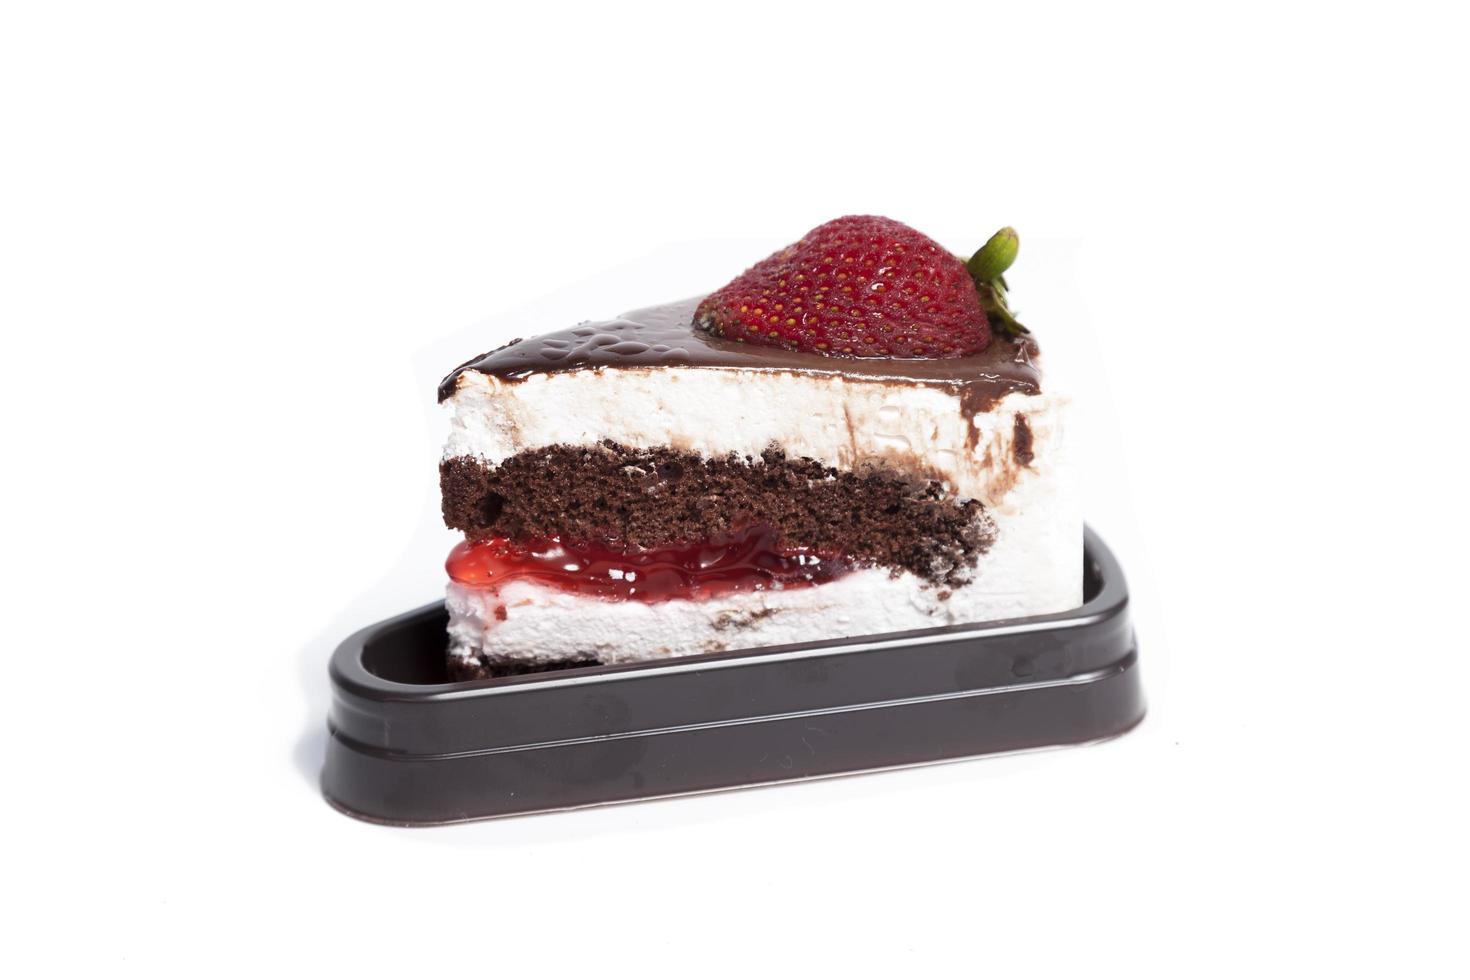 torta di fragole su sfondo bianco foto